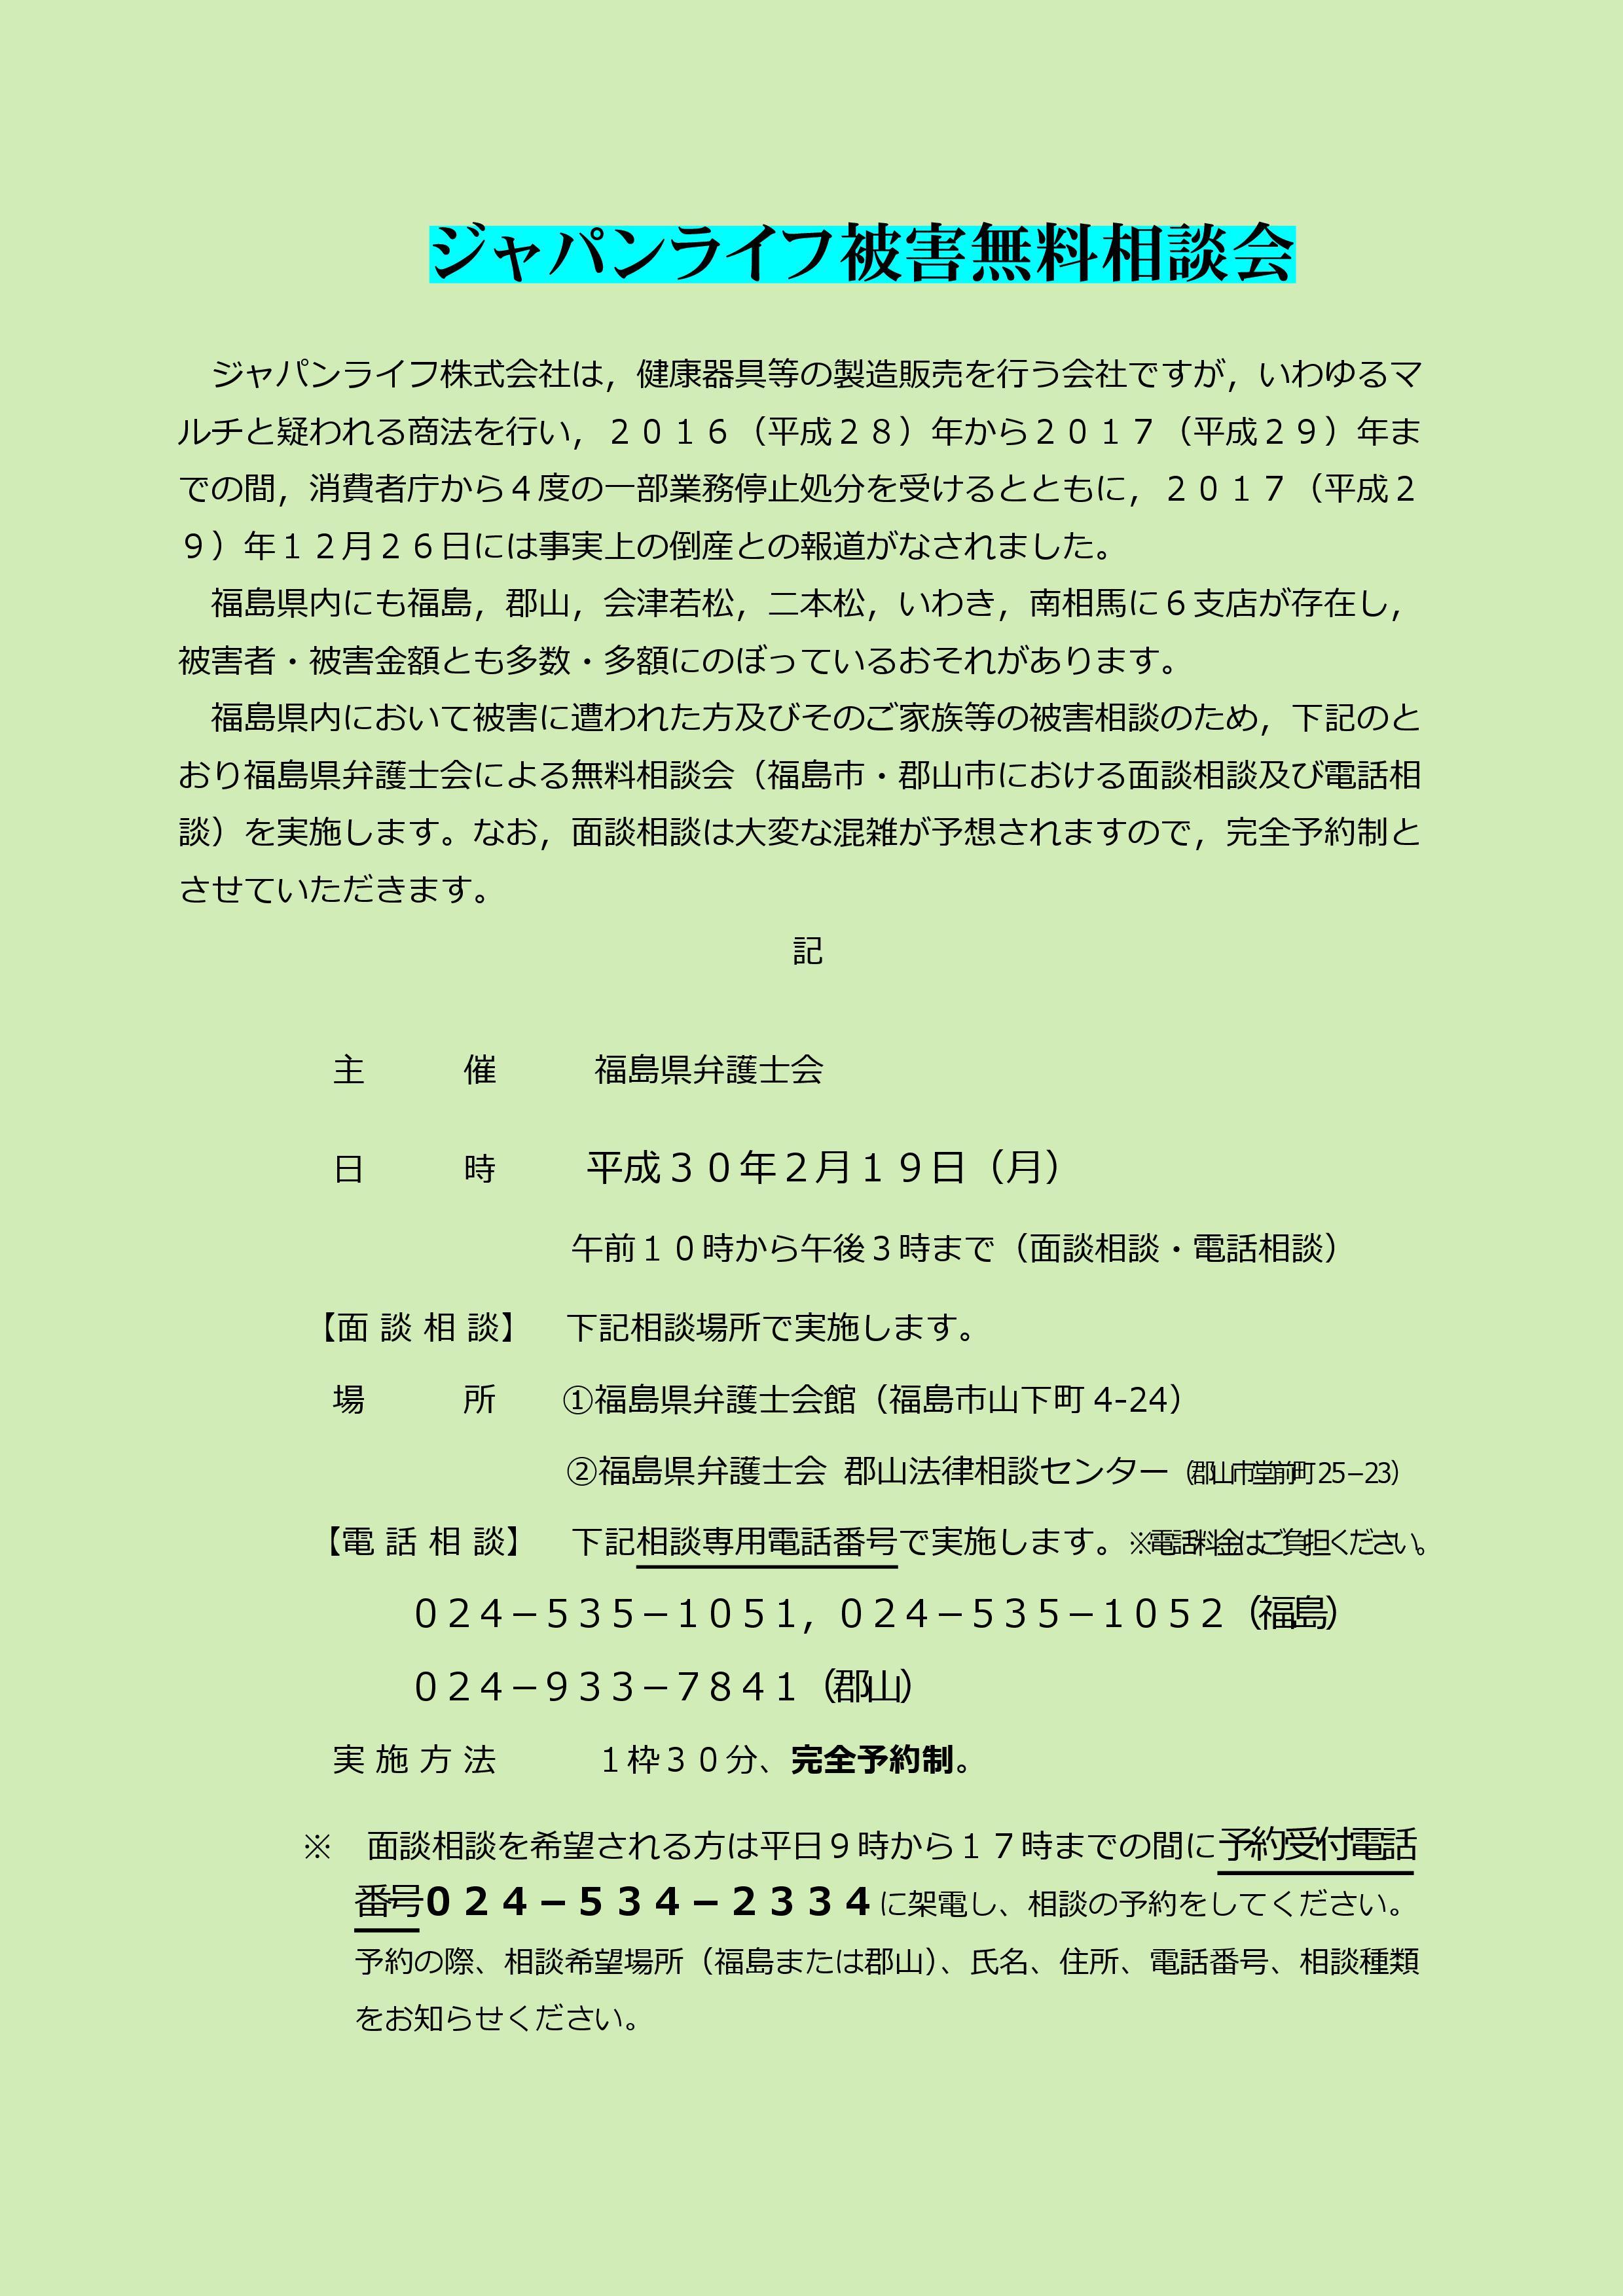 Microsoft Word - JL相談会チラシ(白鳥修正)